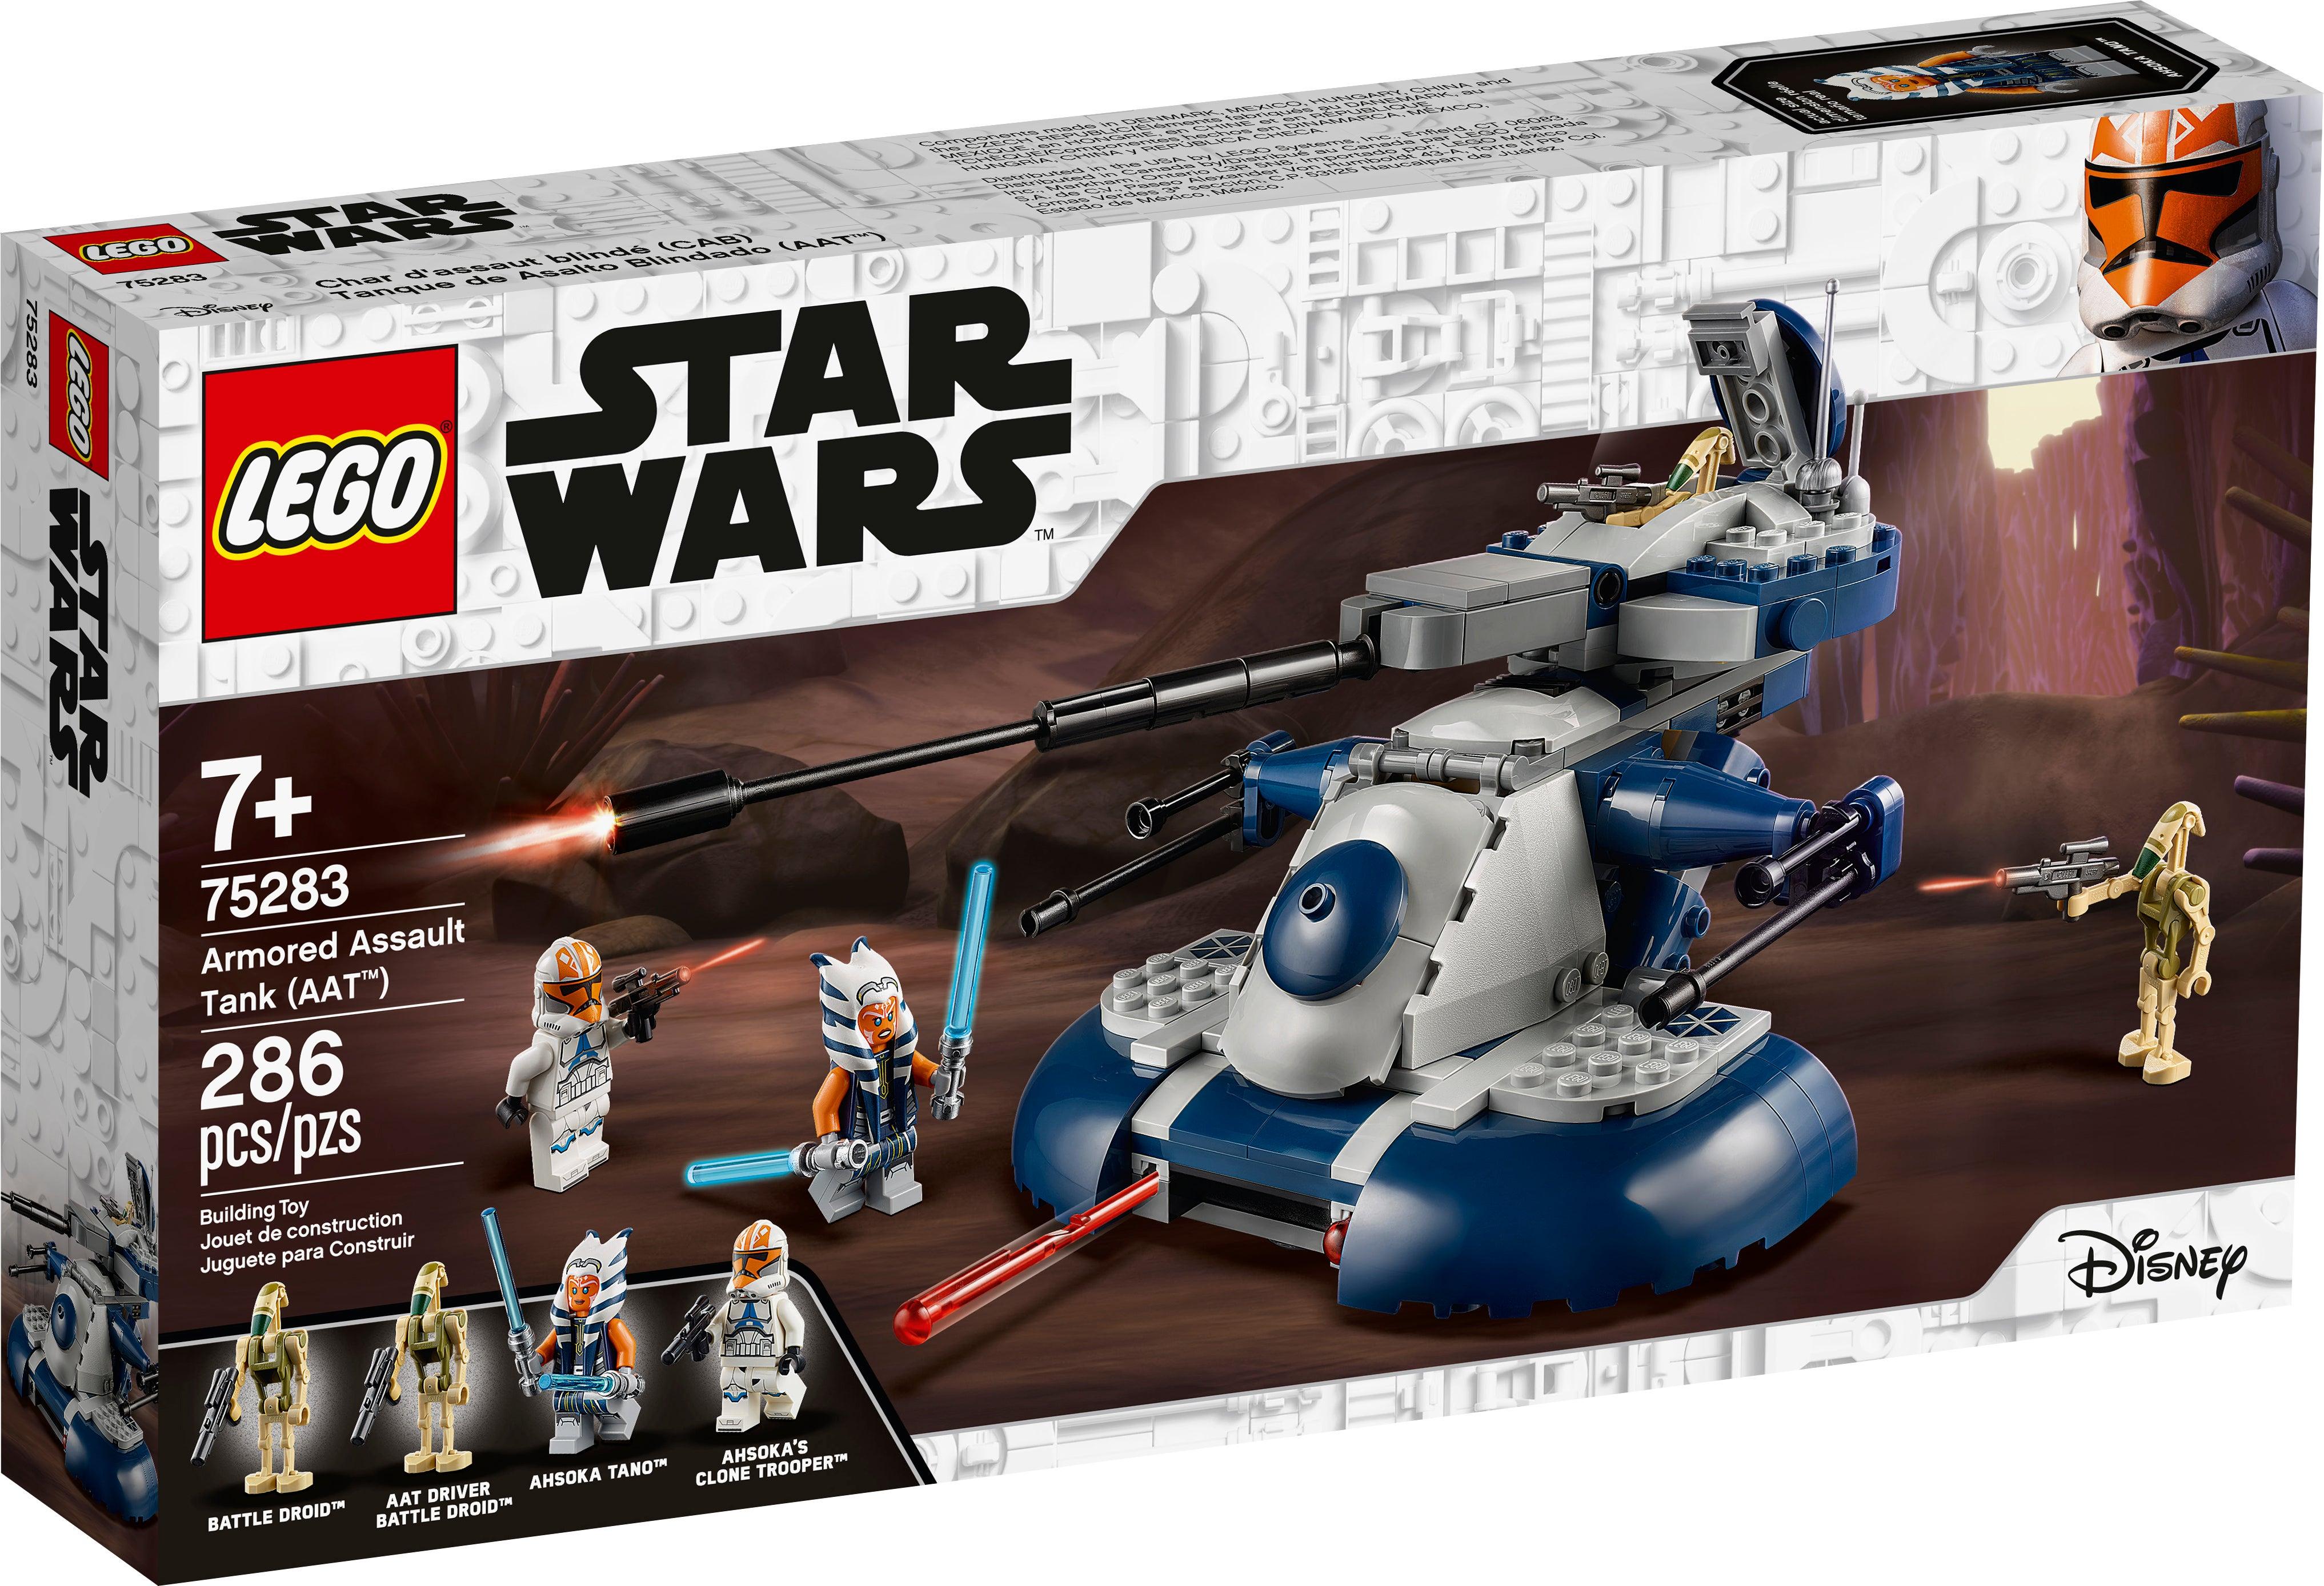 LEGO Star Wars Battle Droids x20 BATTLE PACK